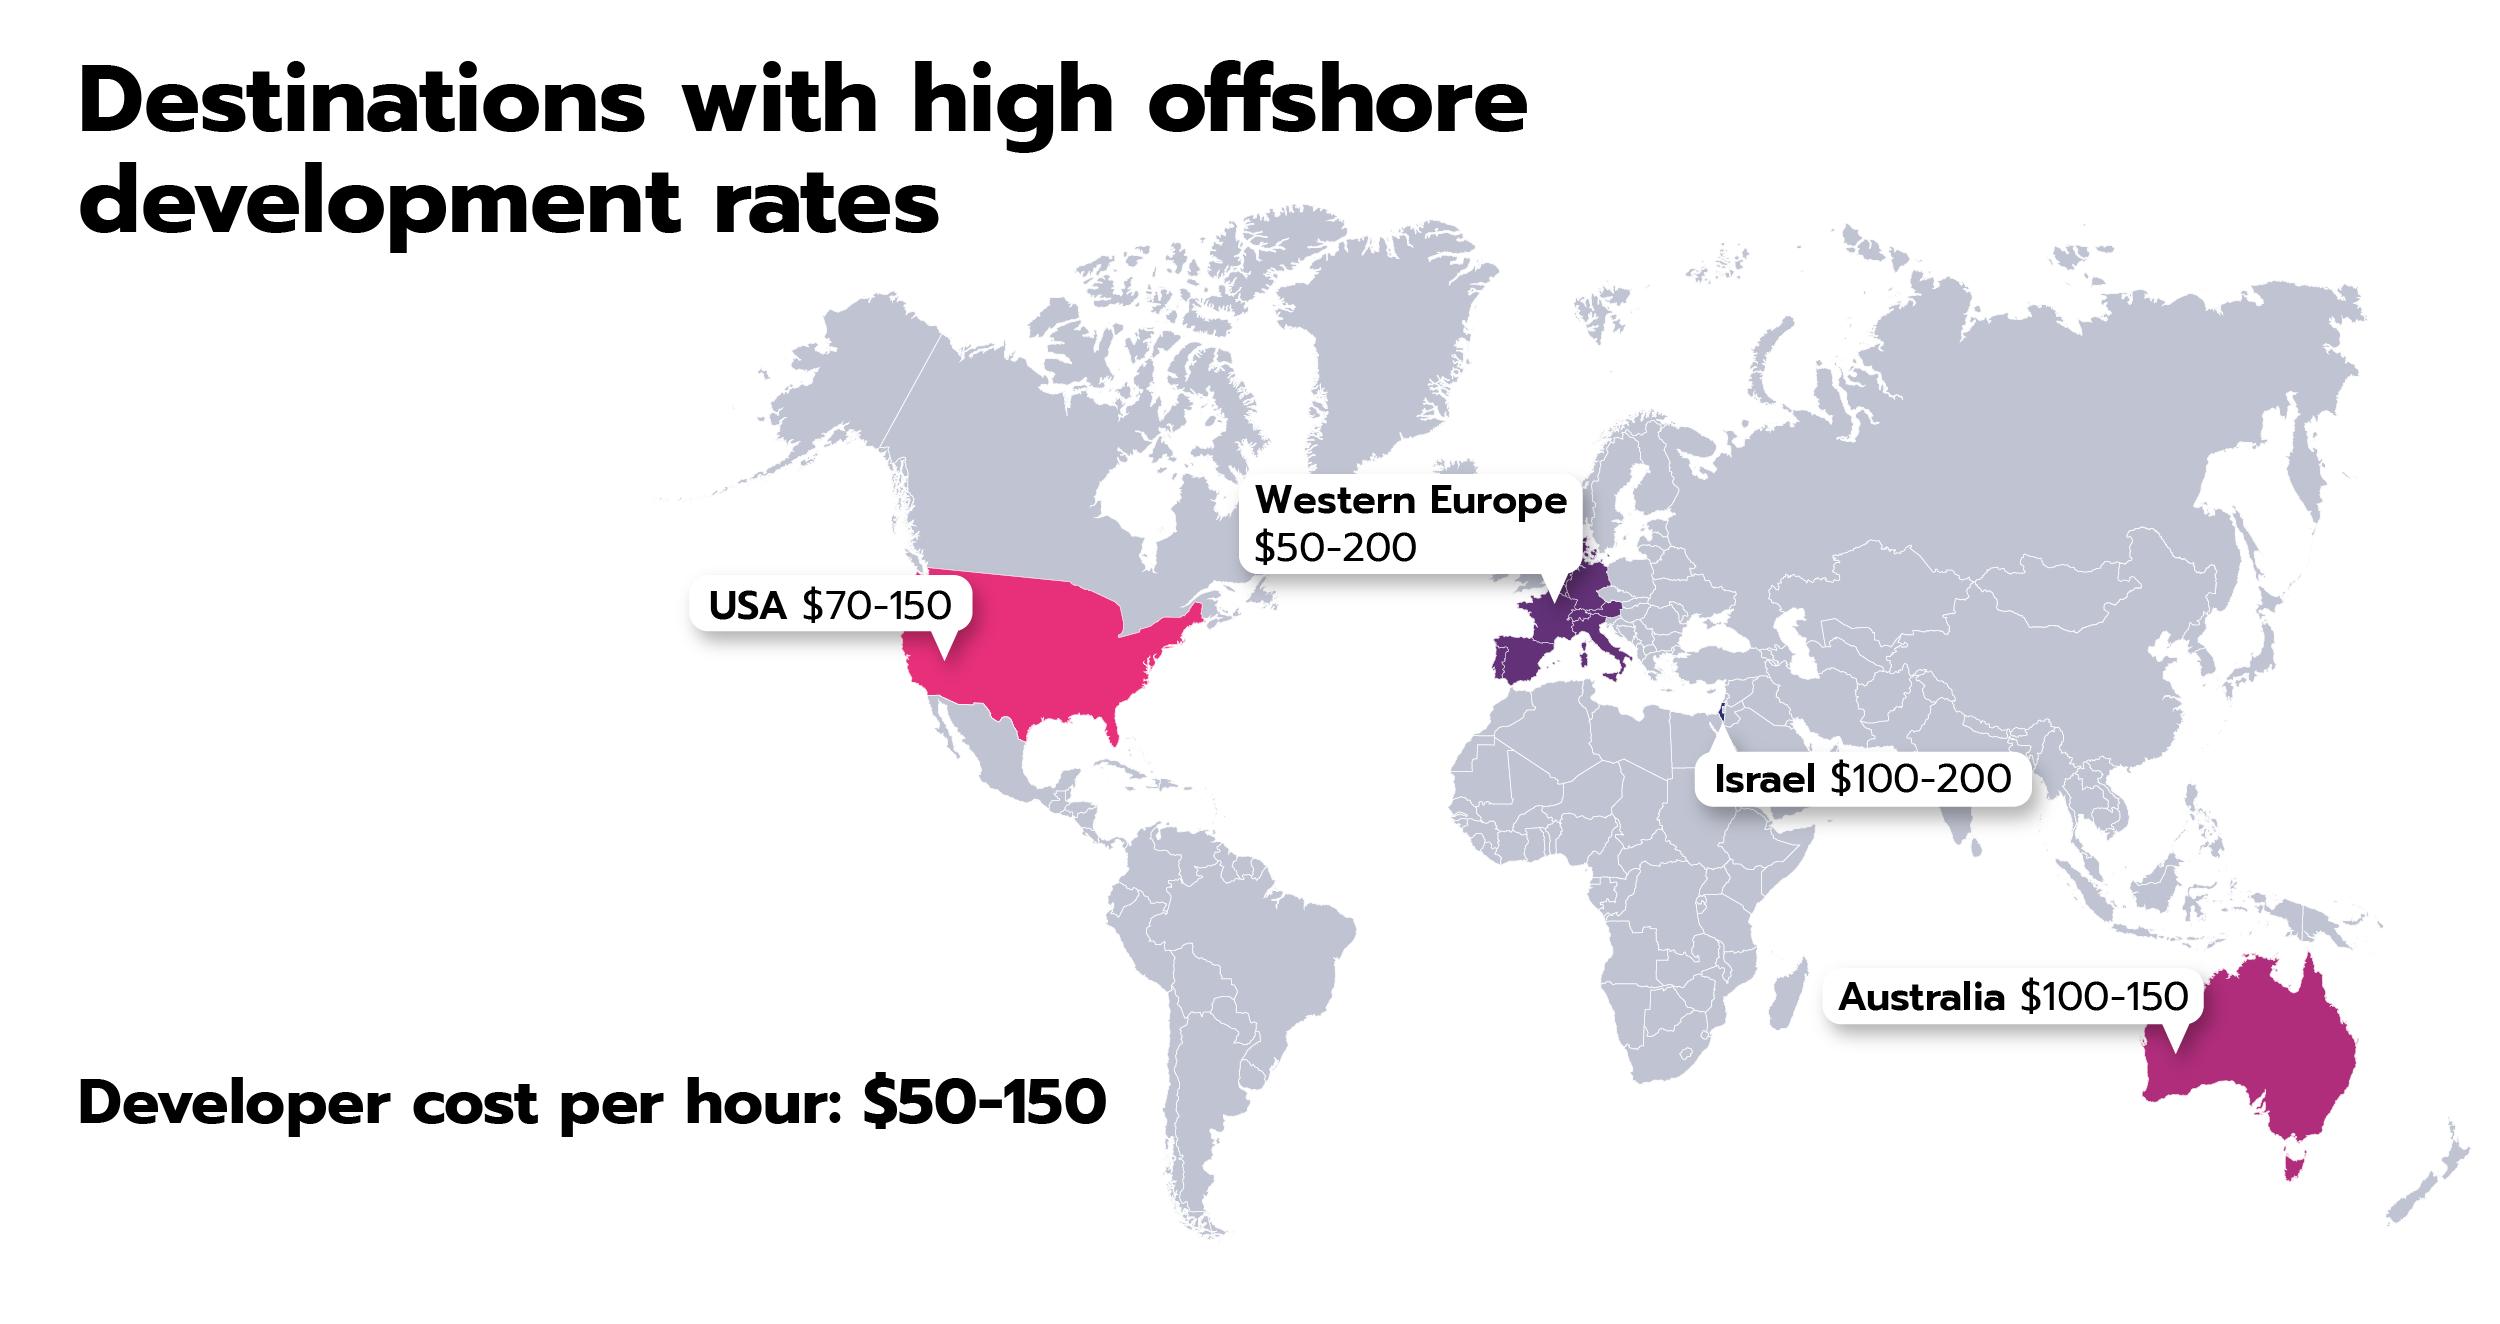 Offshore development rates around the world.